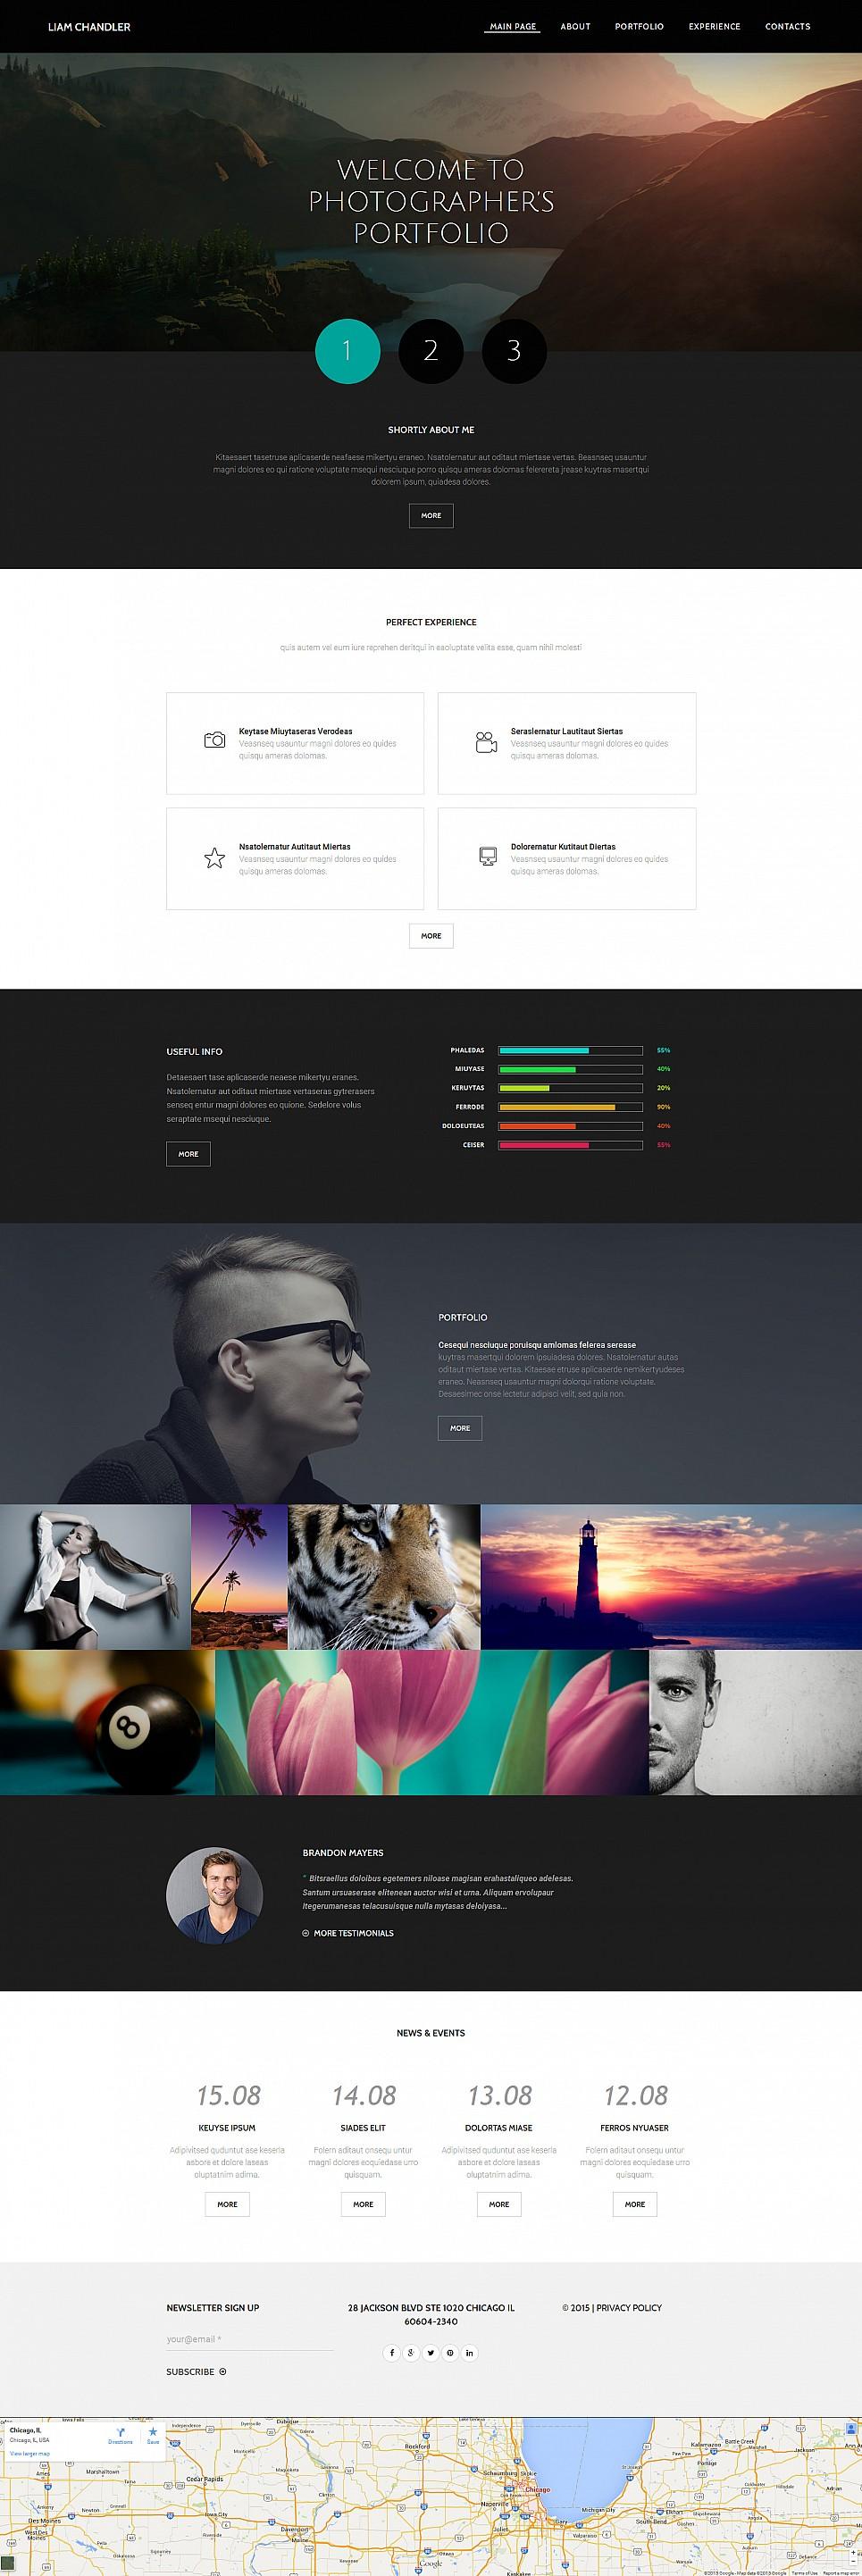 Online portfolio for photographers